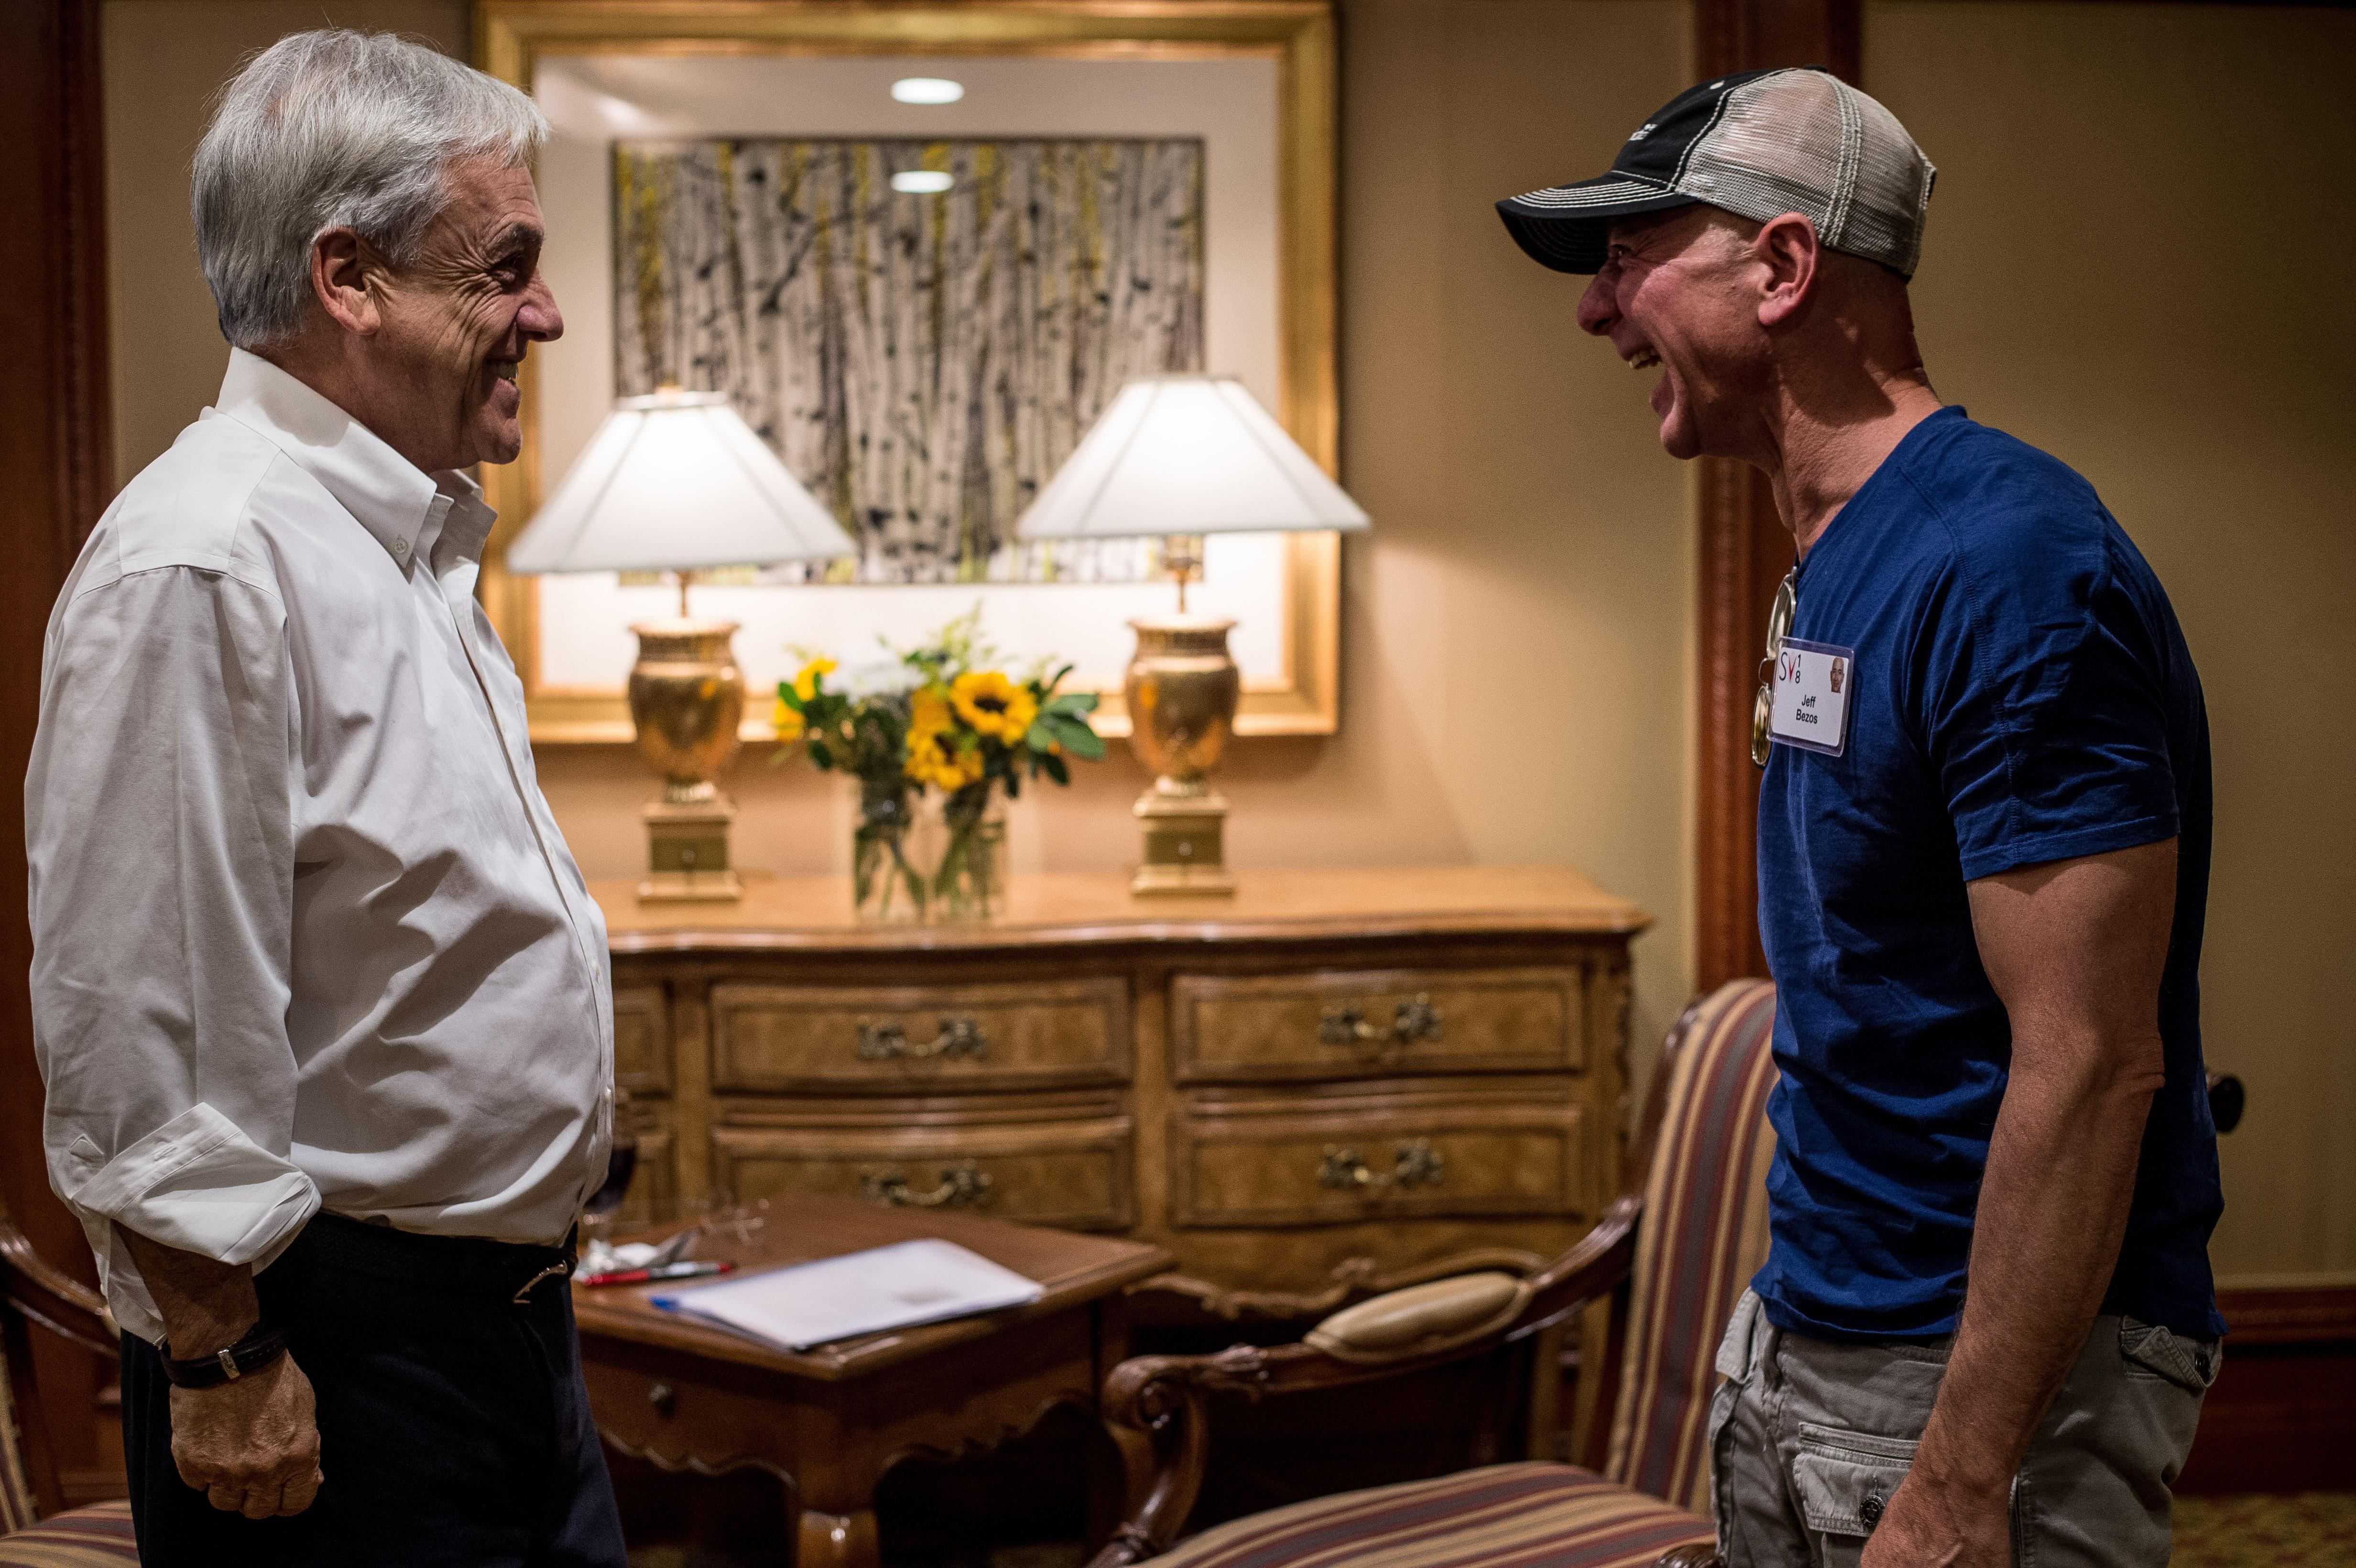 Piñera concreta reunión con Bezos en medio del interés de que Amazon ...